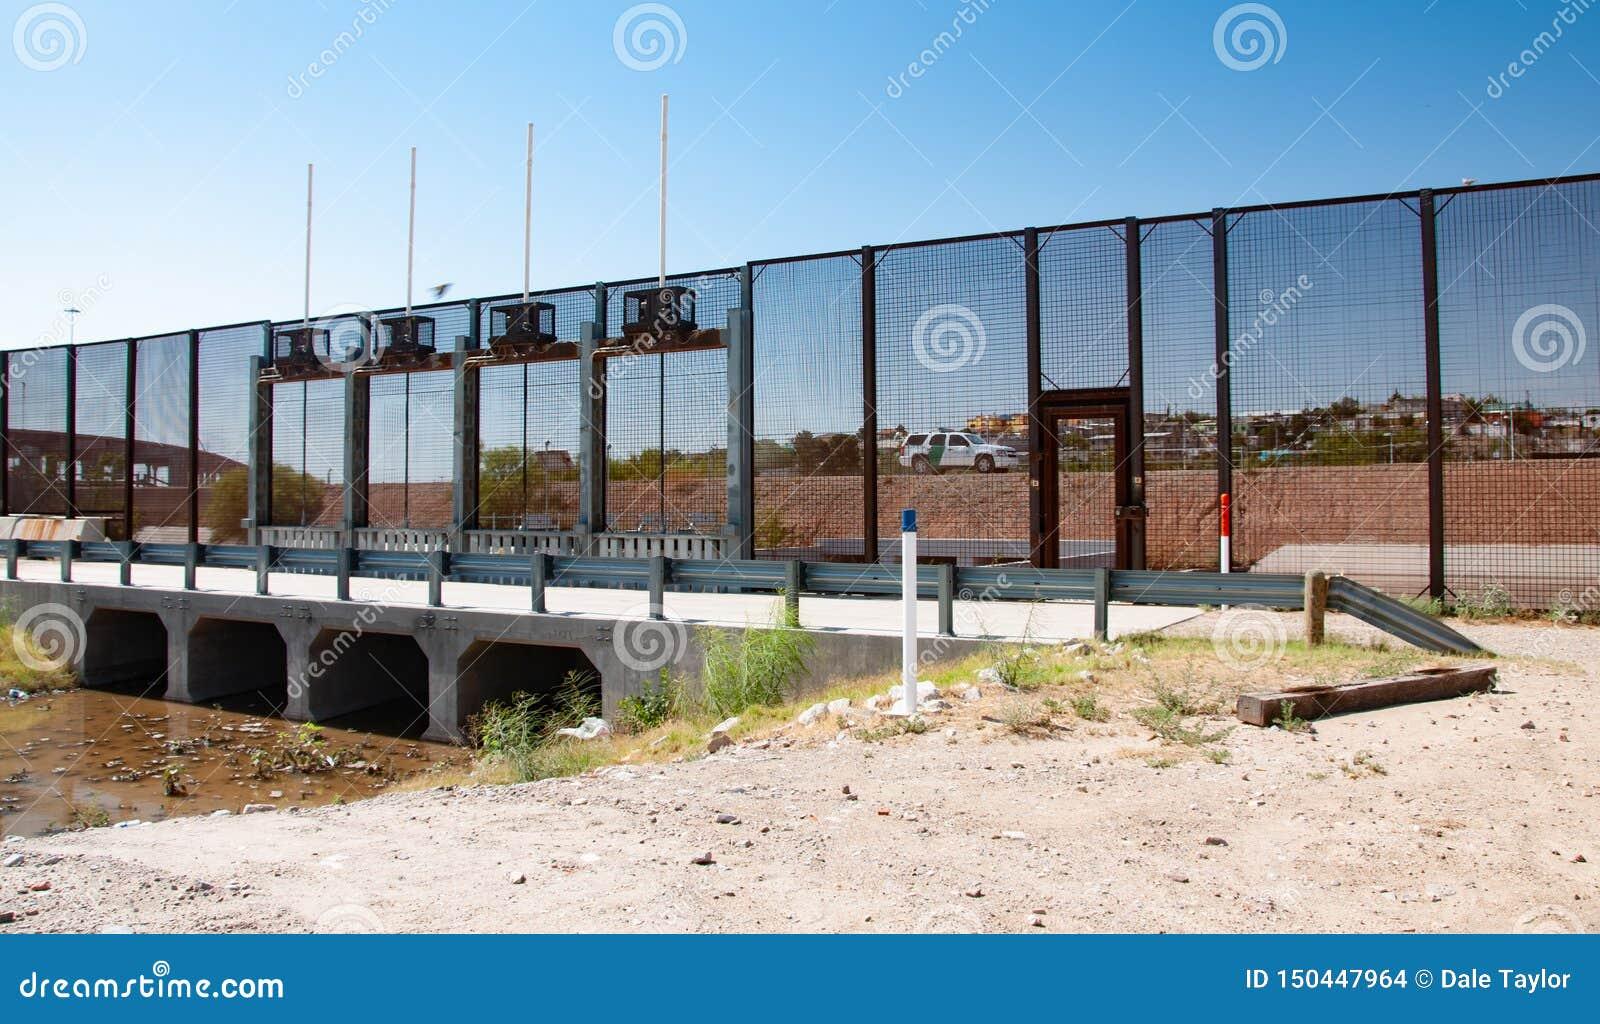 Sectie van internationale grensmuur in El Paso